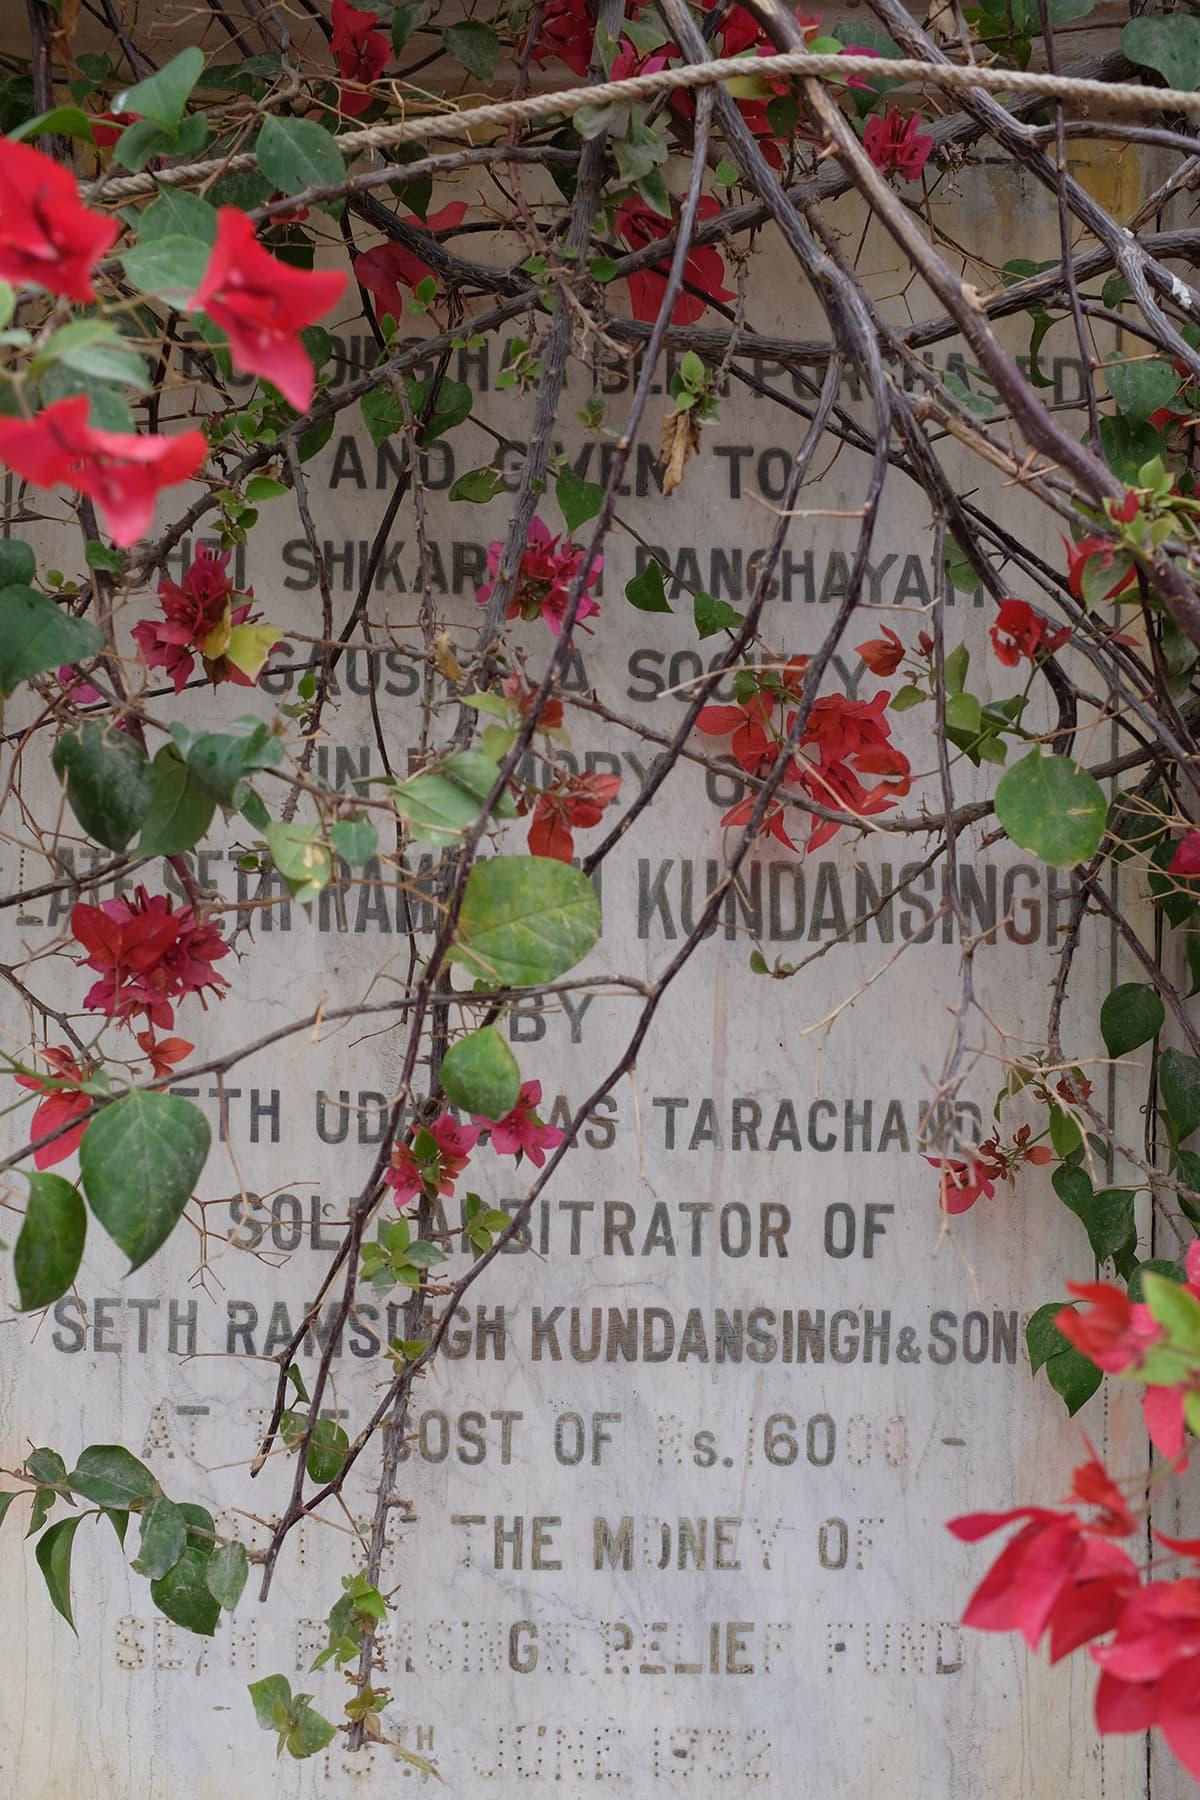 A plaque reading Shikarpuri Panchayat.